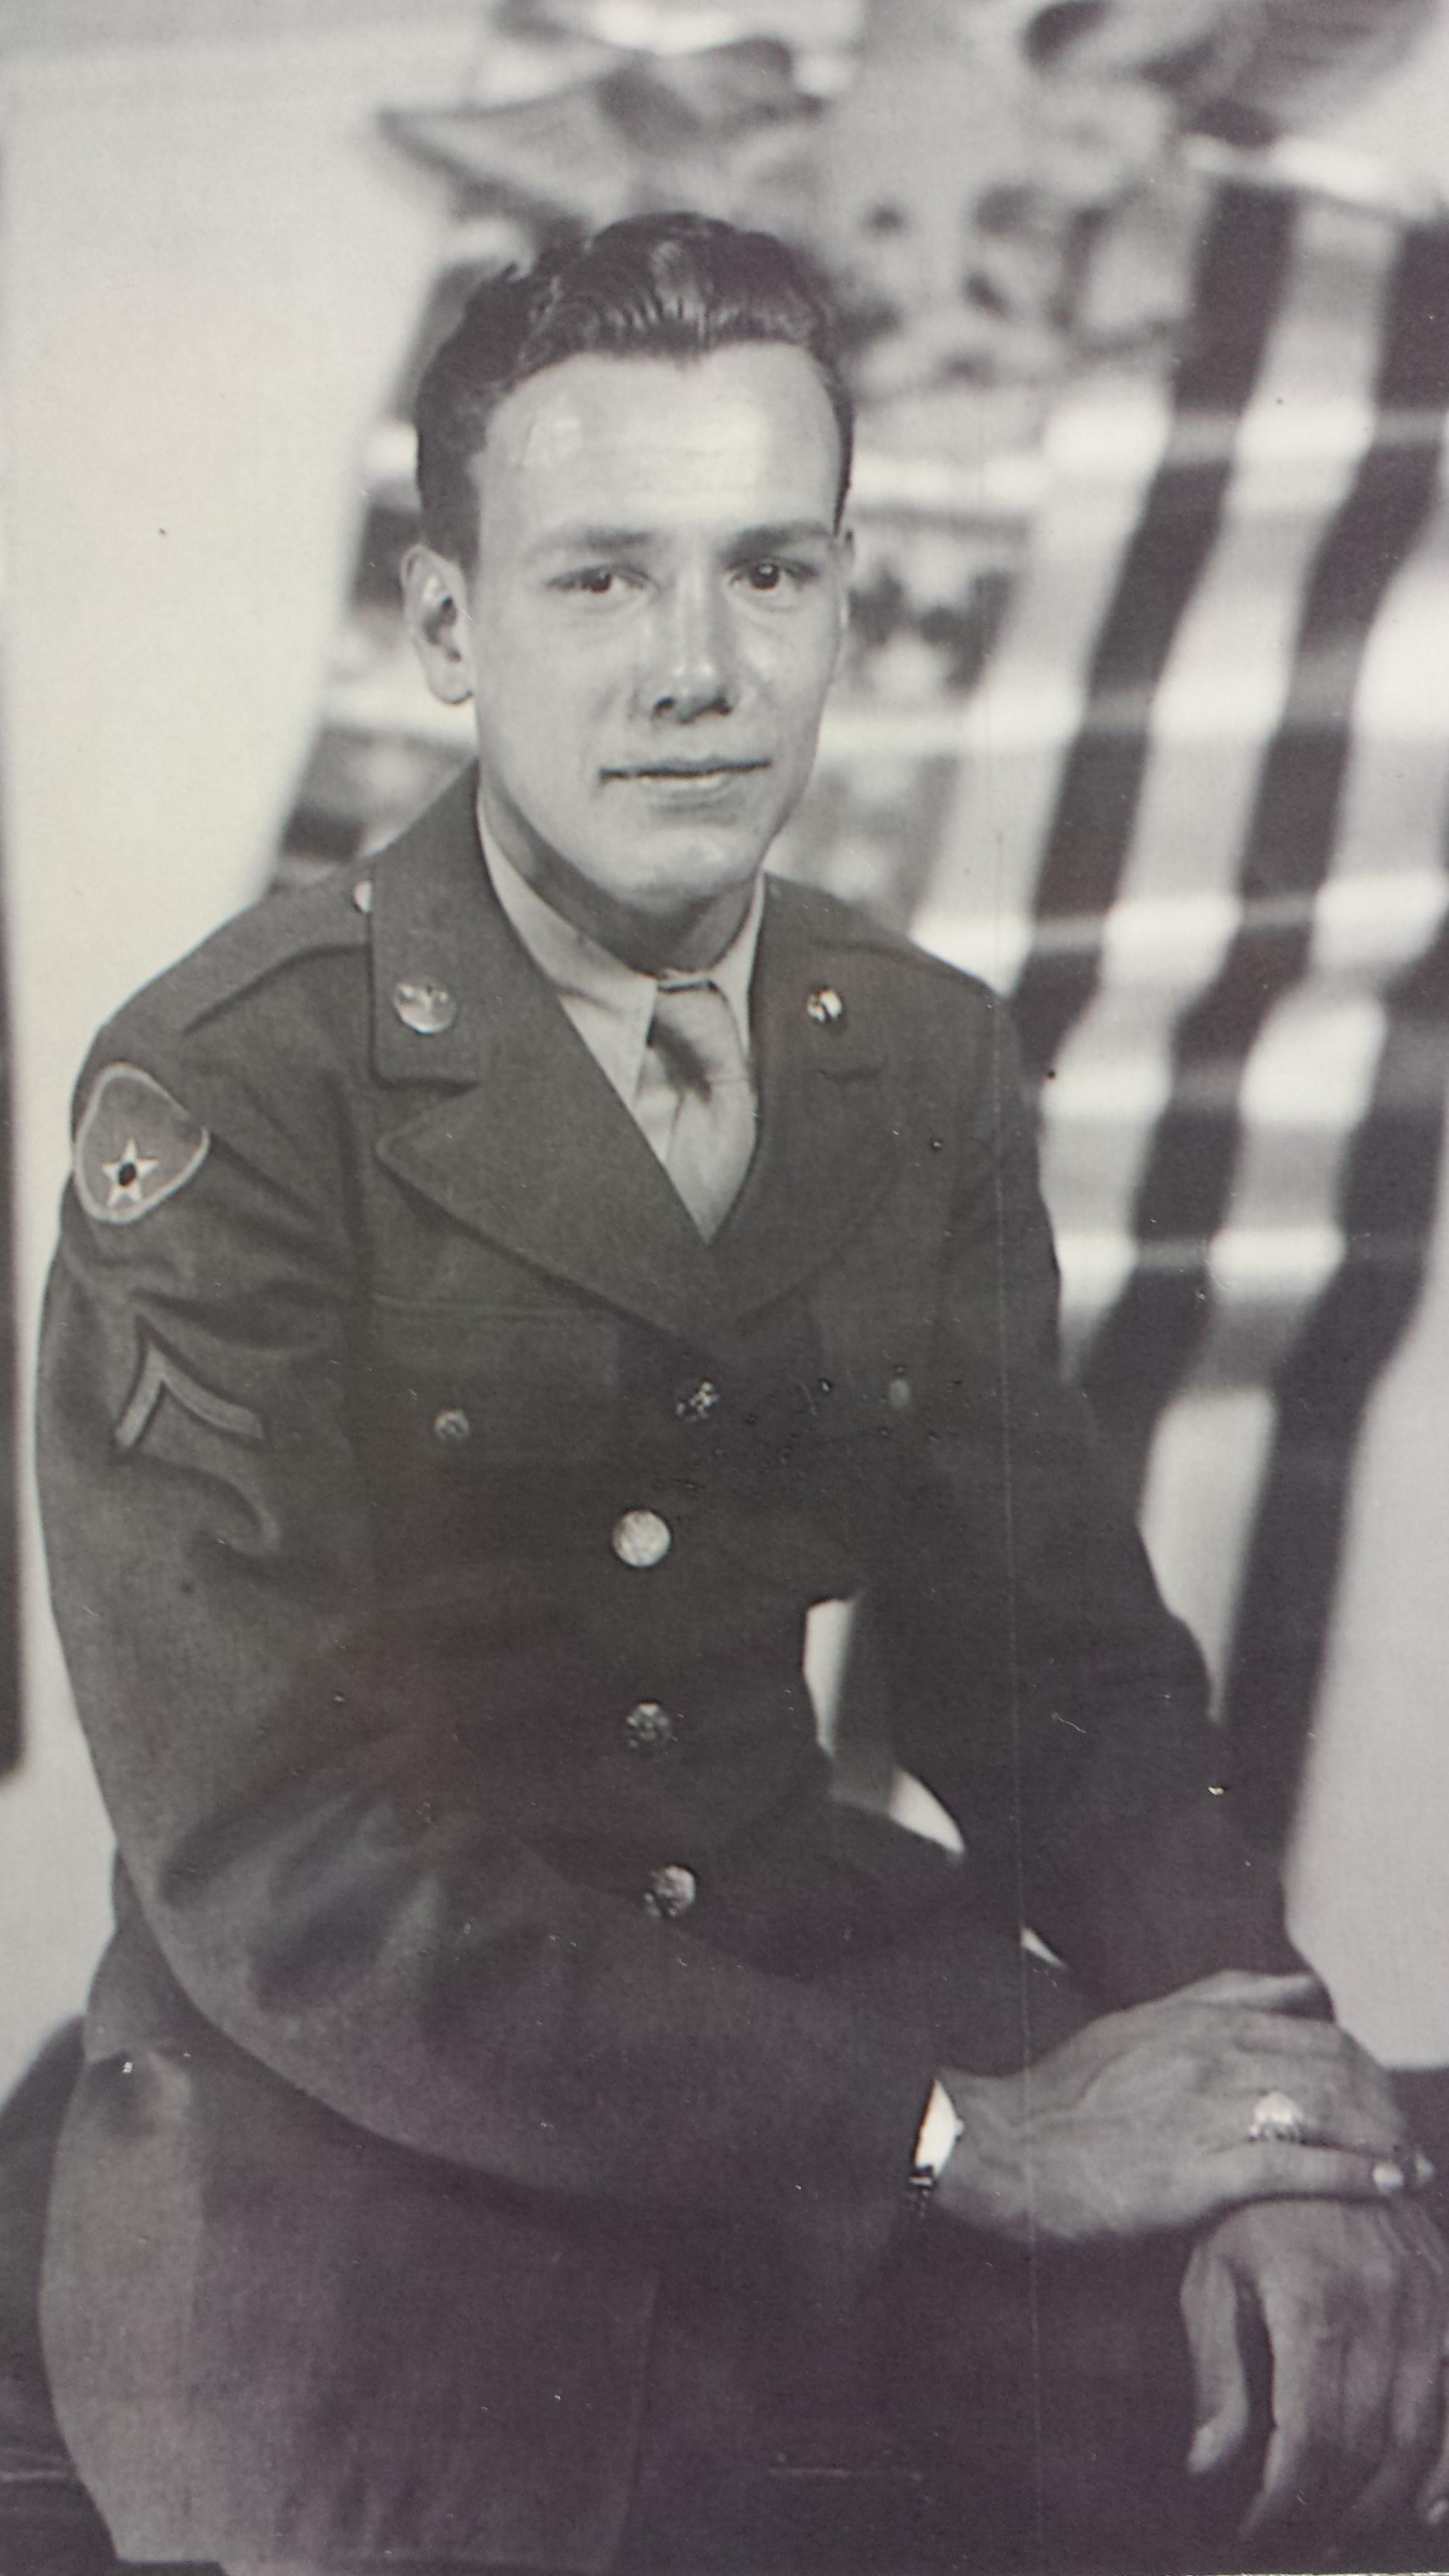 Robert W. Galluzzo